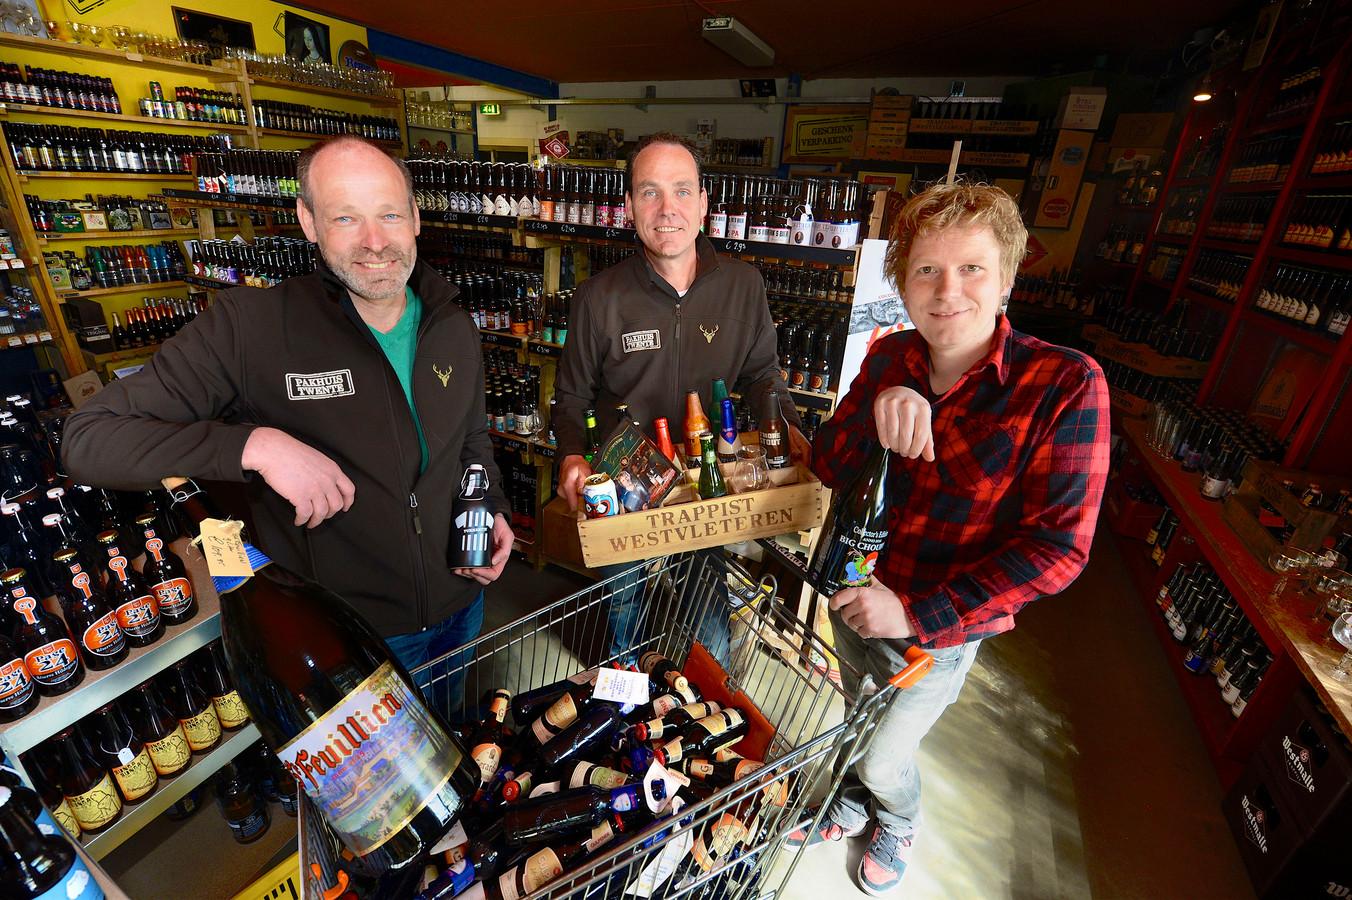 Edward Morshuis, Marc Morshuis en Thijs Kemperink (van links naar rechts) in Pakhuis Twente Albergen.